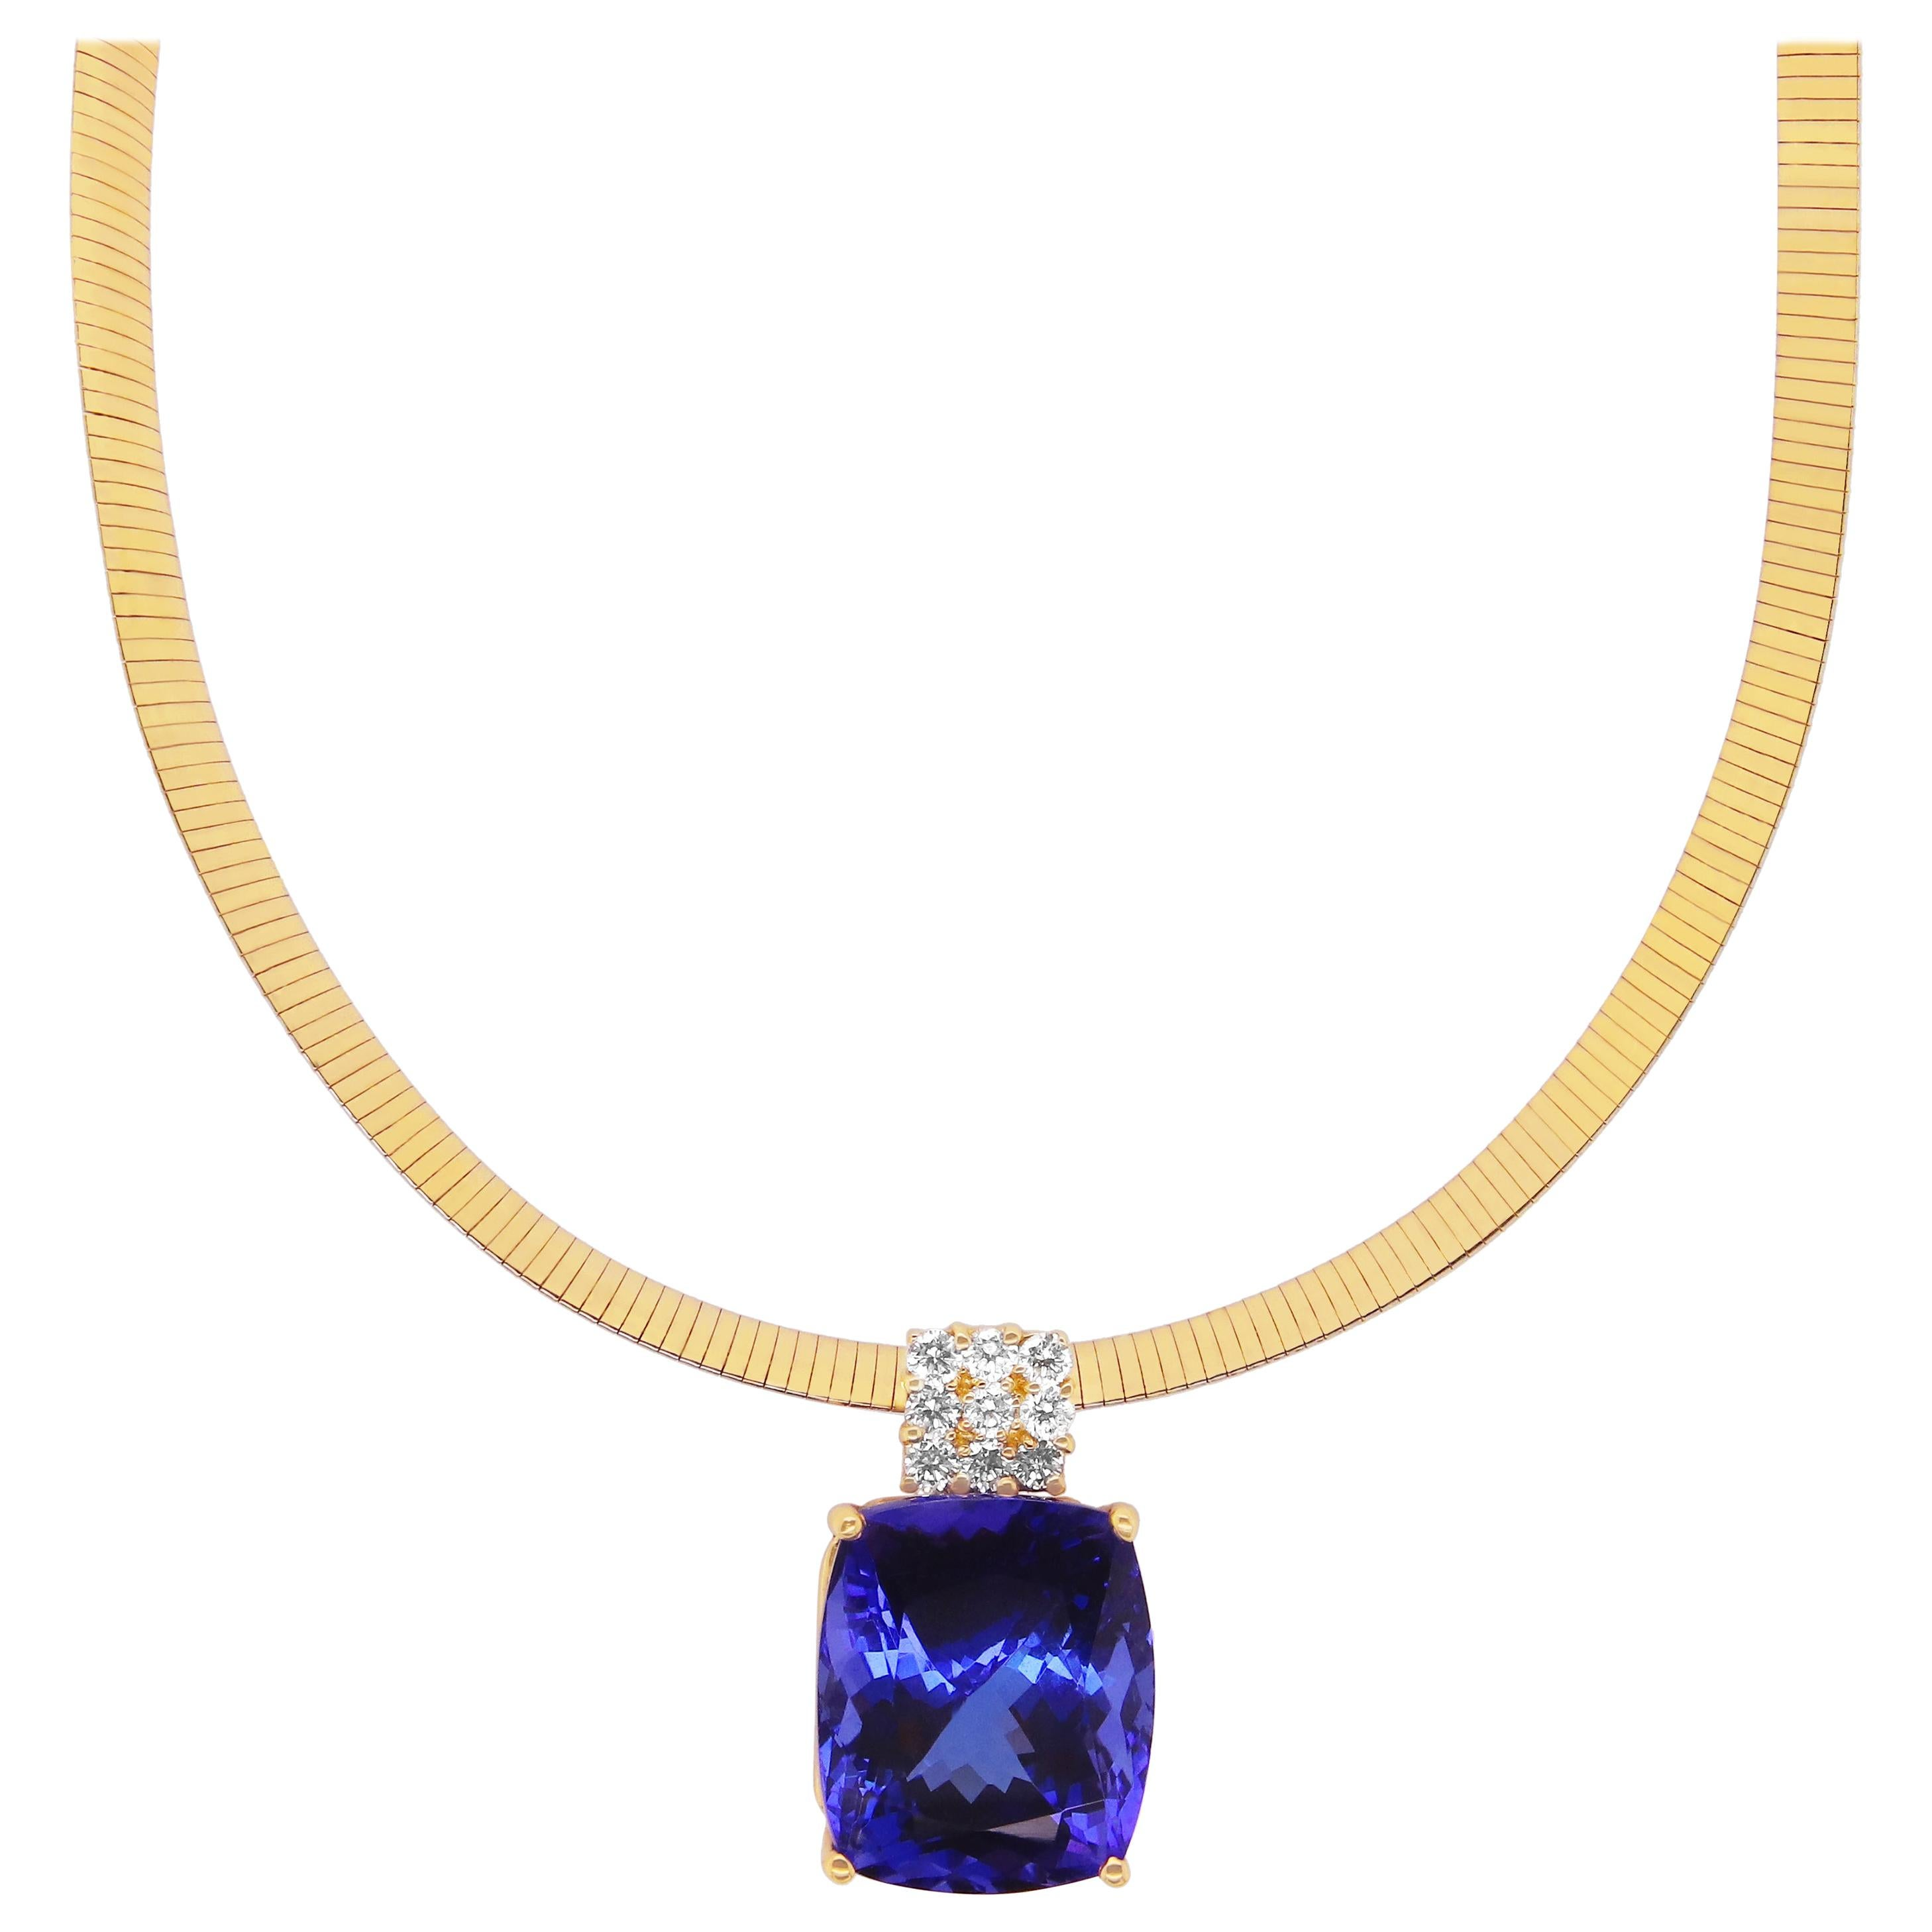 25.70 Carat Cushion Cut Tanzanite White Diamond Pendant Omega Necklace 14K Gold